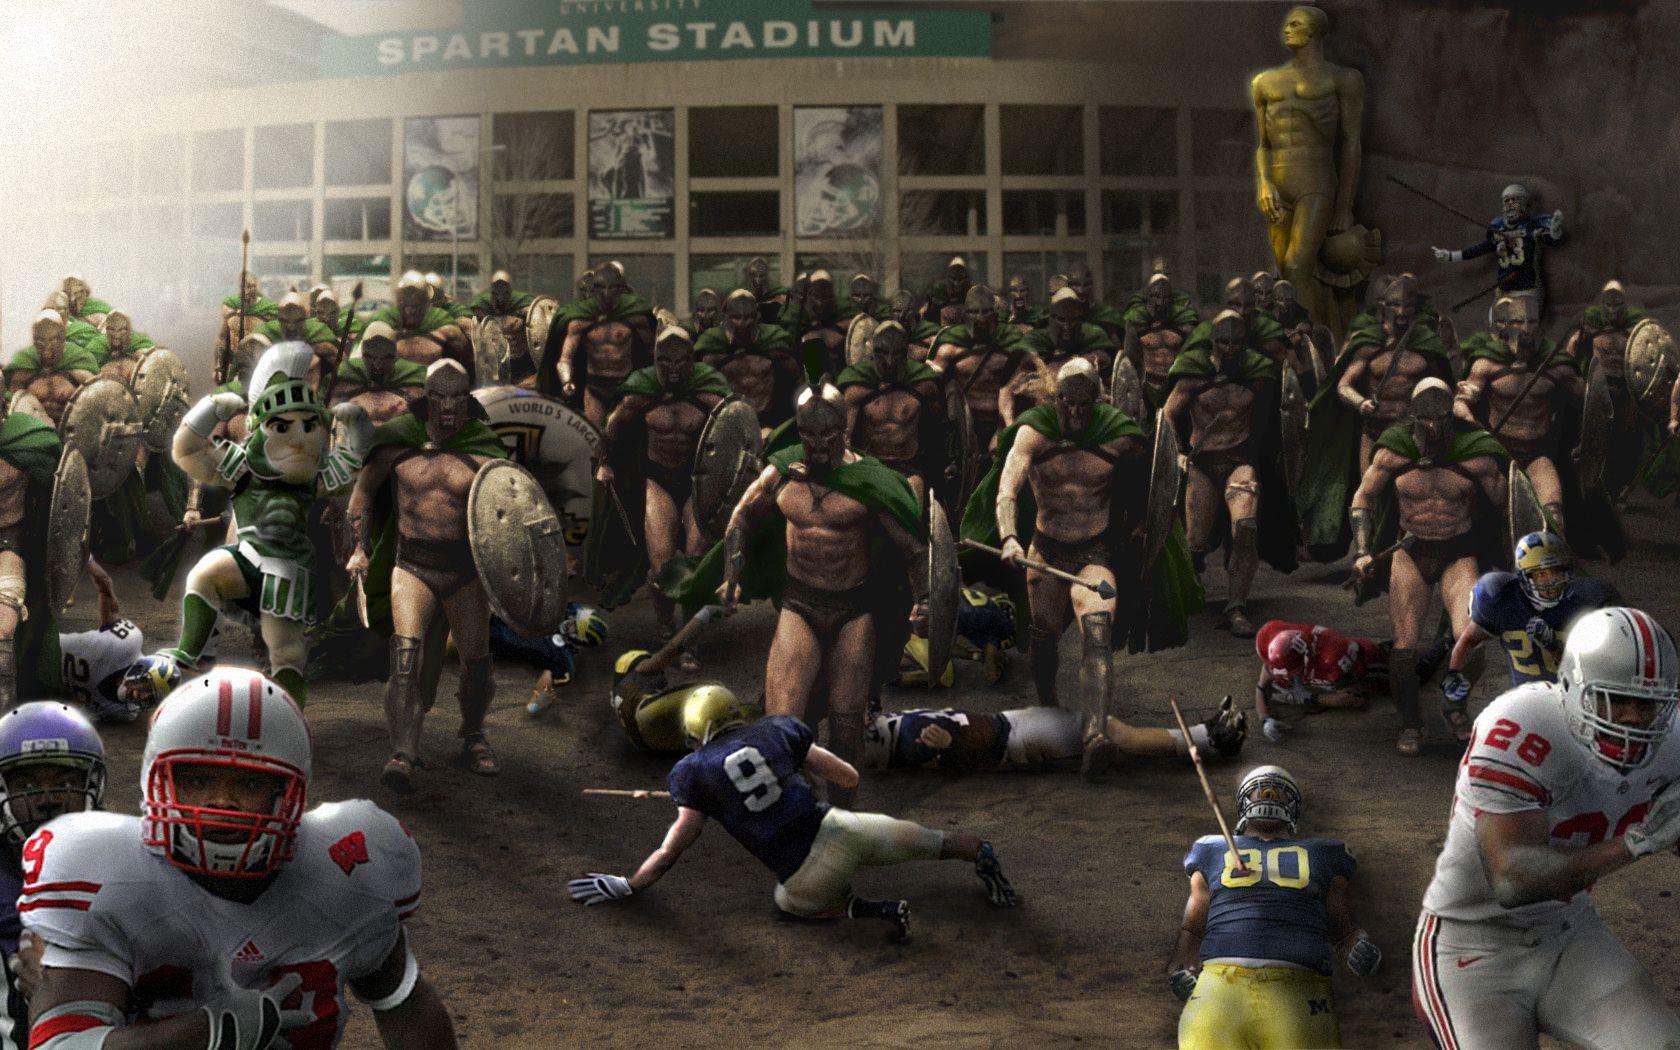 Spartan American Football Big Ten NCAA Michigan State Spartans 1680x1050